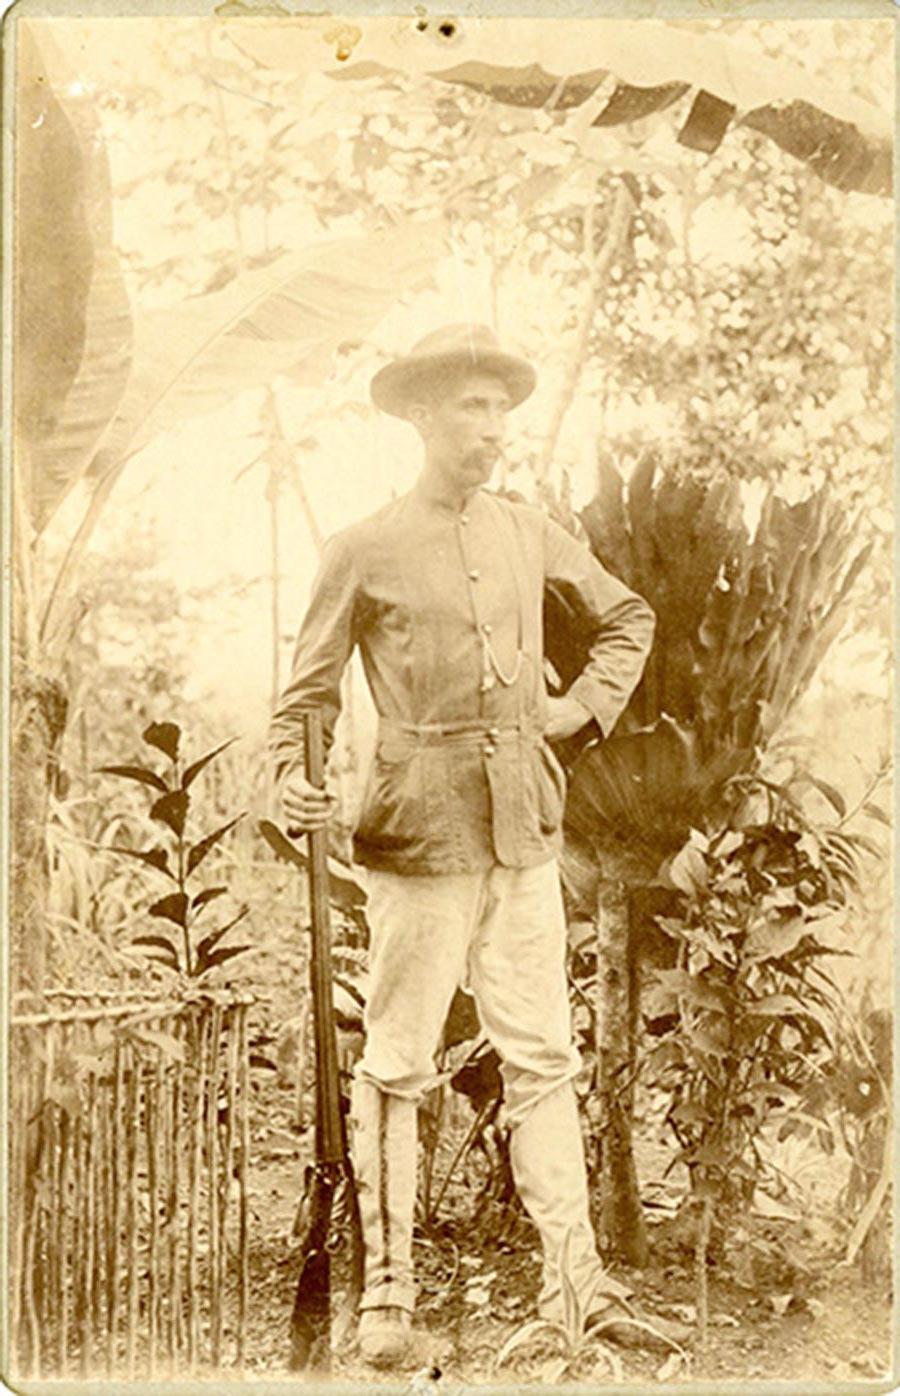 Joseph Schmitz, vers 1890 © photographe inconnu, drotis réservés